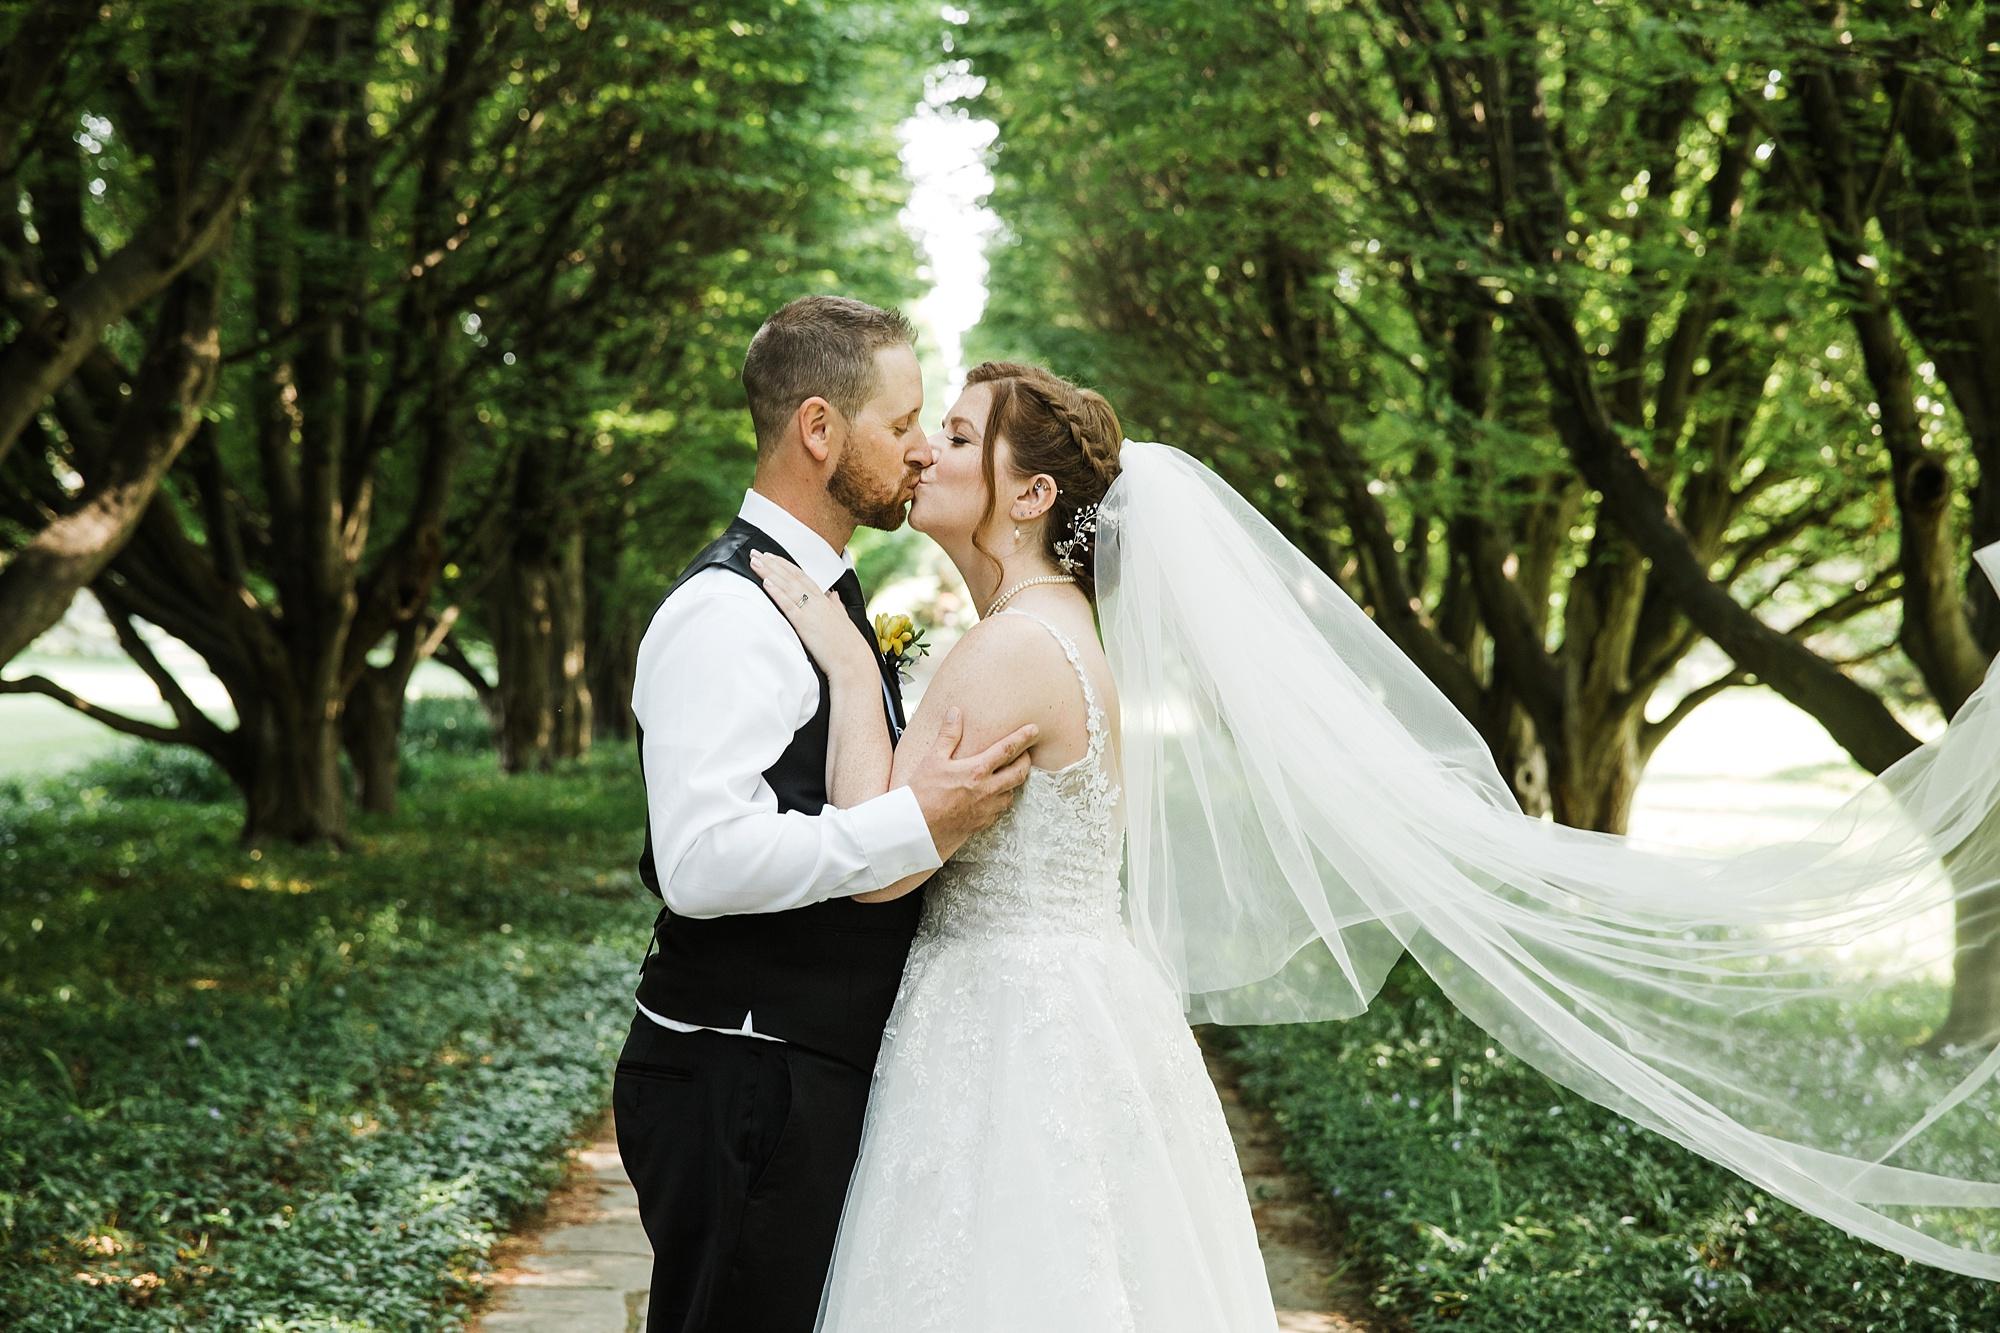 niagarafalls-weddingphotography_0036.jpg